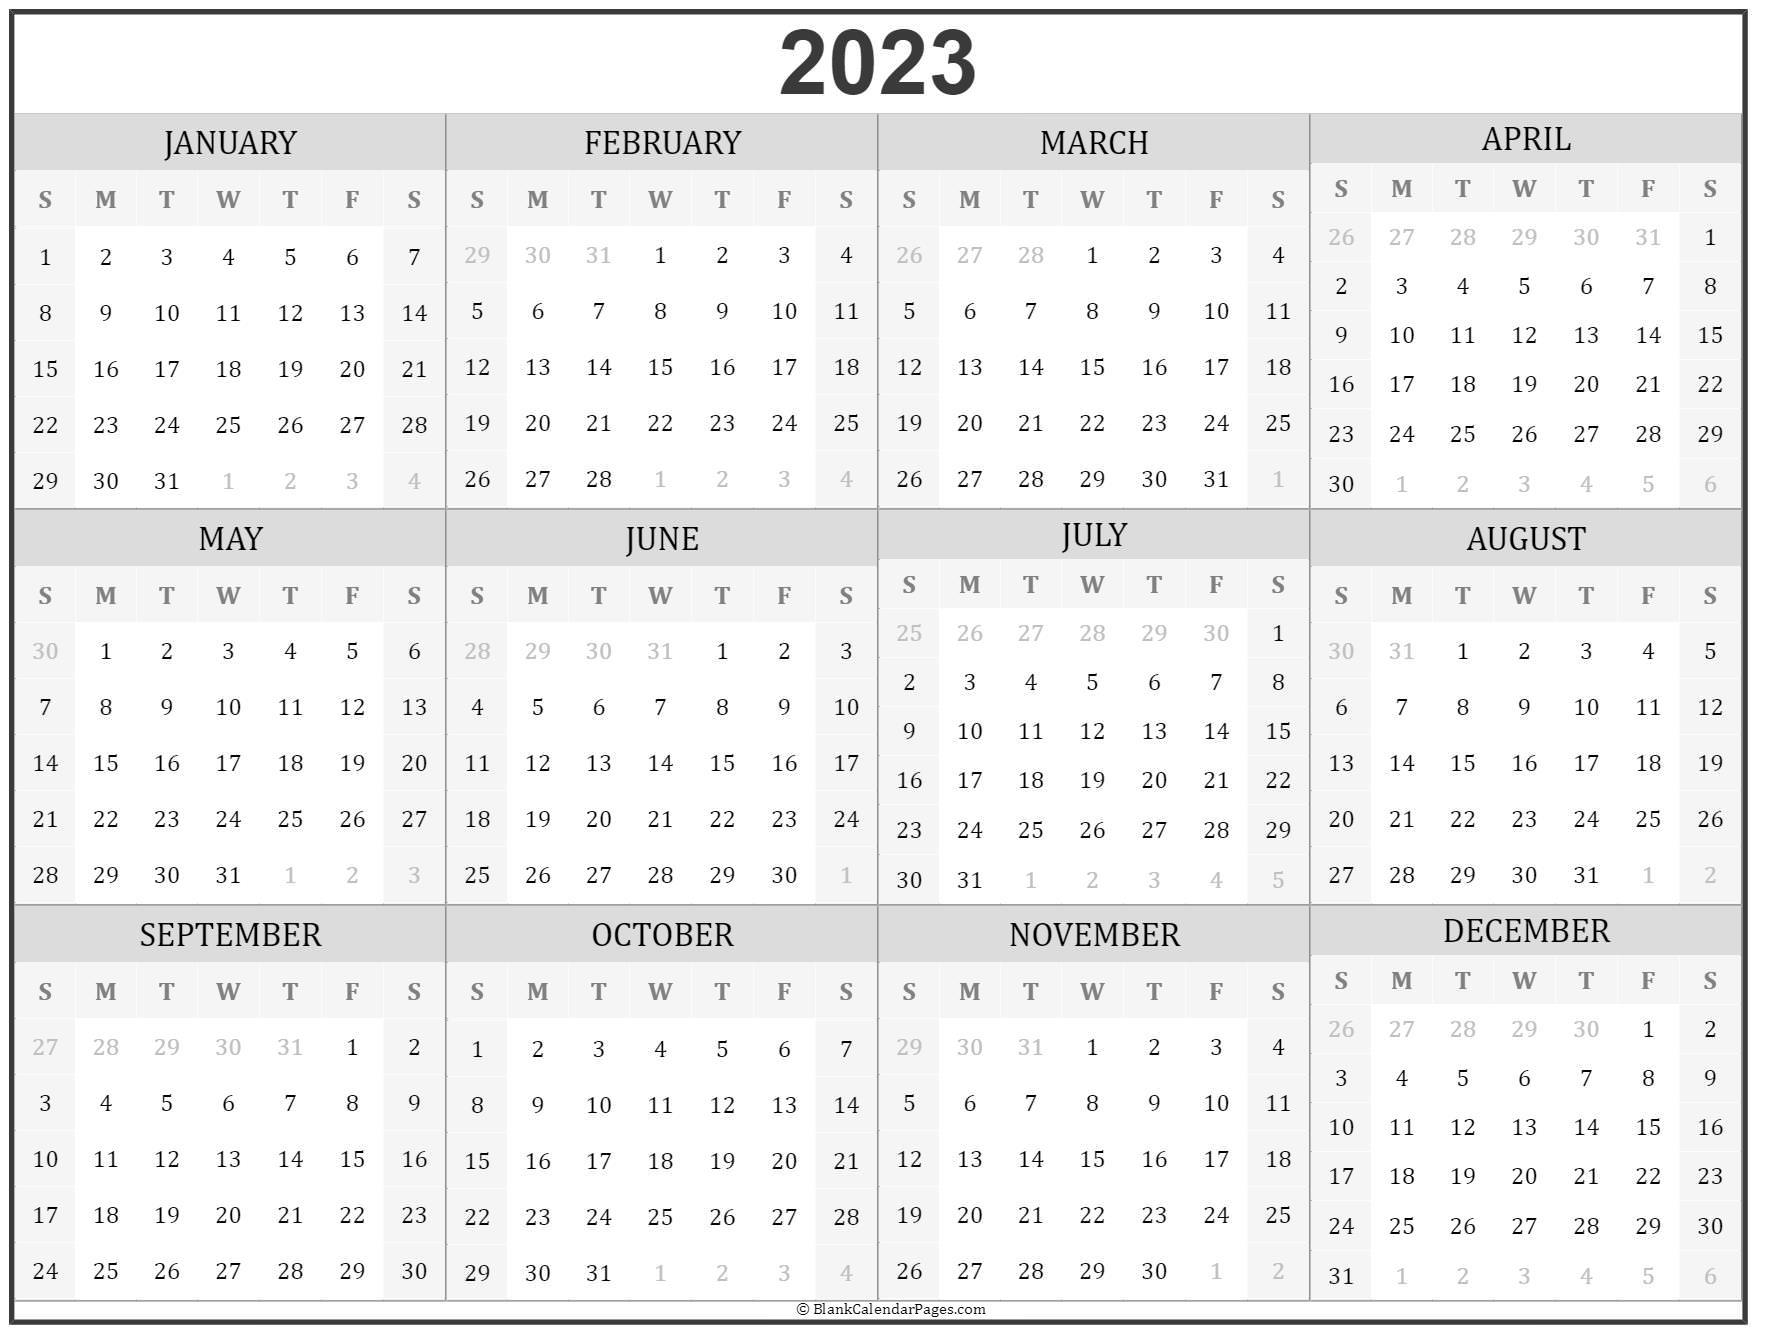 2023 year calendar